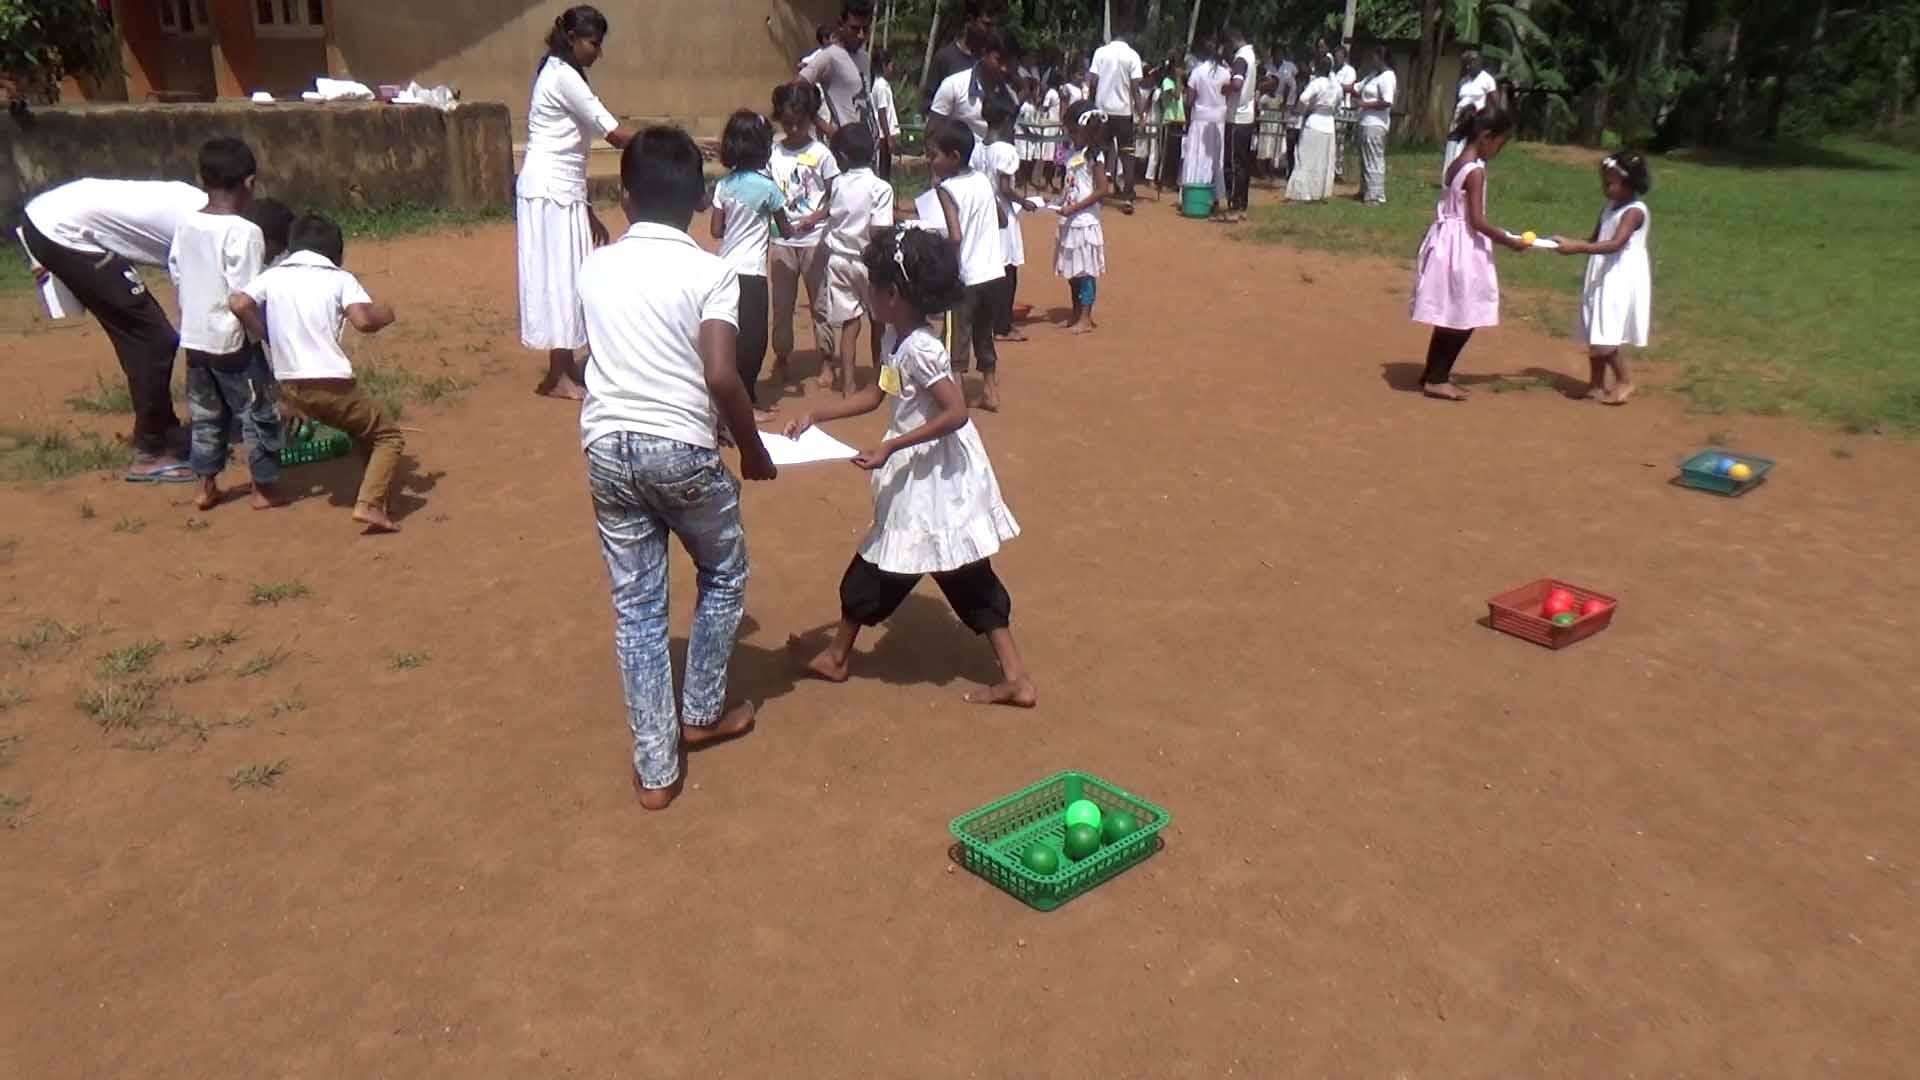 Sati Pasala Mindfulness Camp at Meethirigala Kanishta Vidyalaya-mindful games (26)